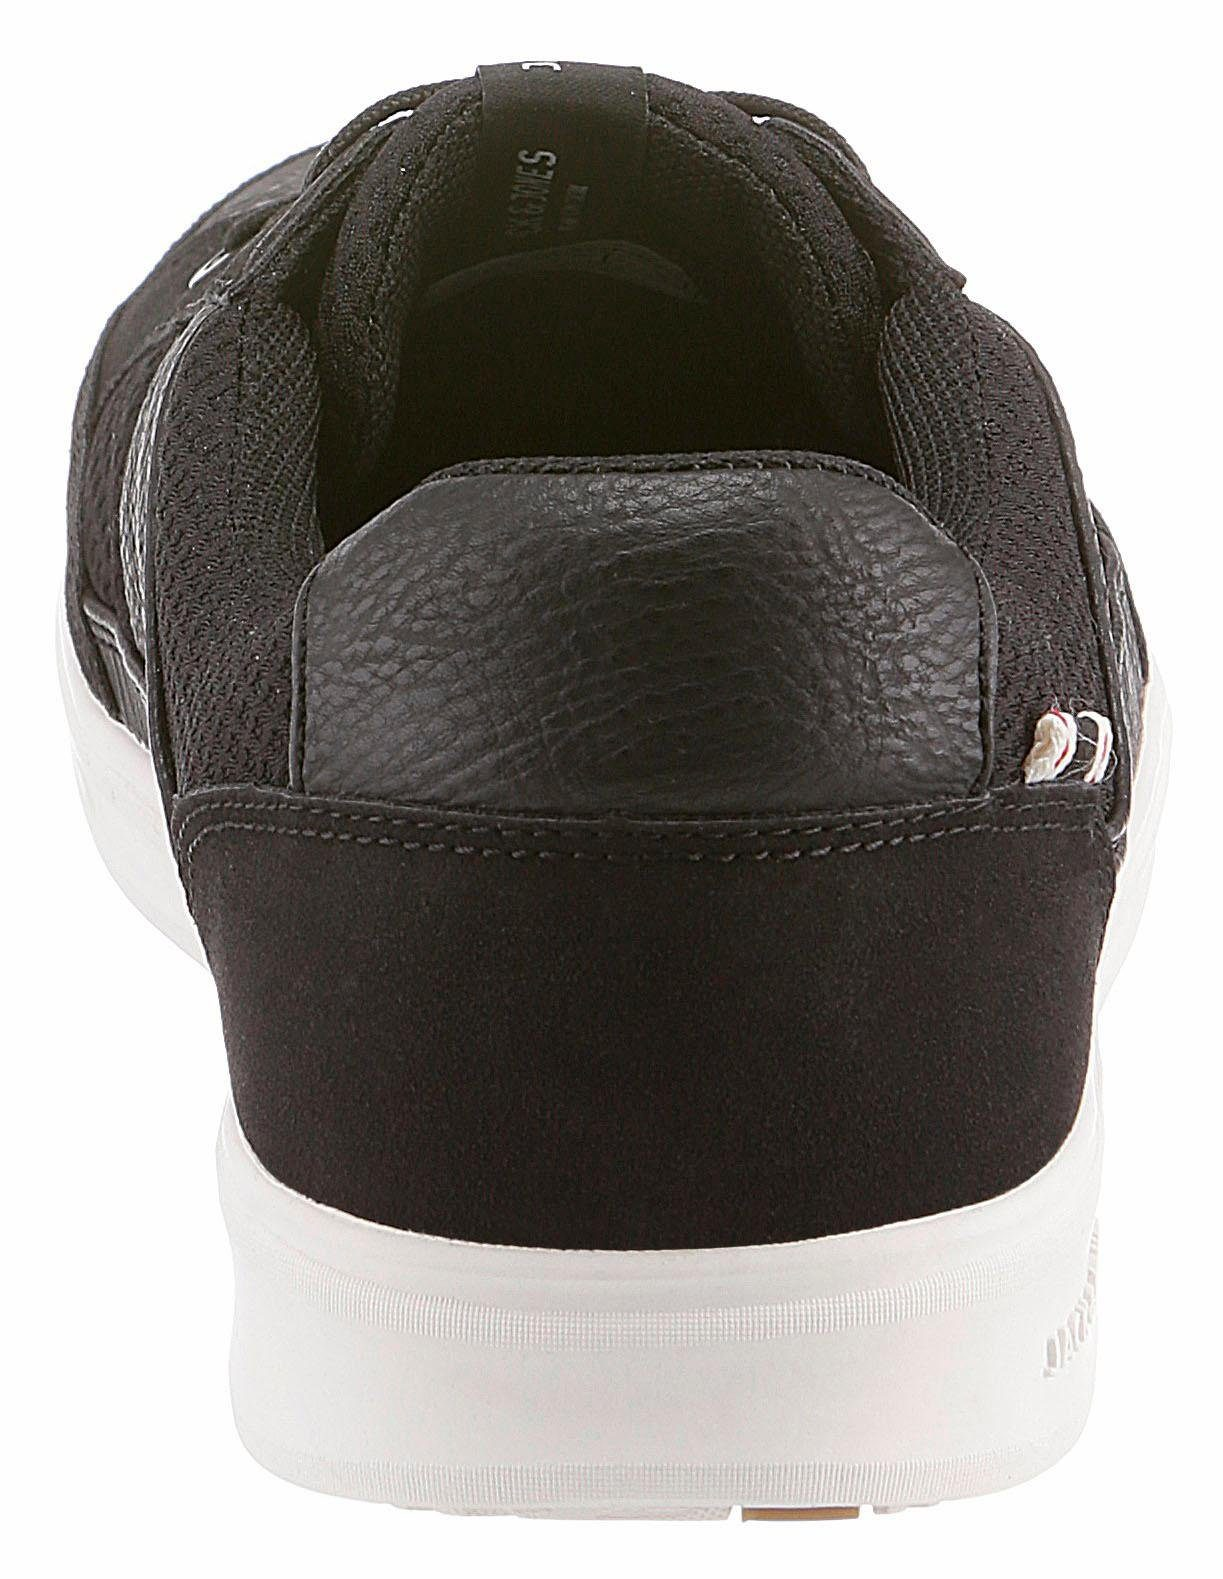 Im nr Rayne 3567390589 Jack Materialmix amp; Jfw Artikel Sneaker Jones Schwarz qTPPfSXw